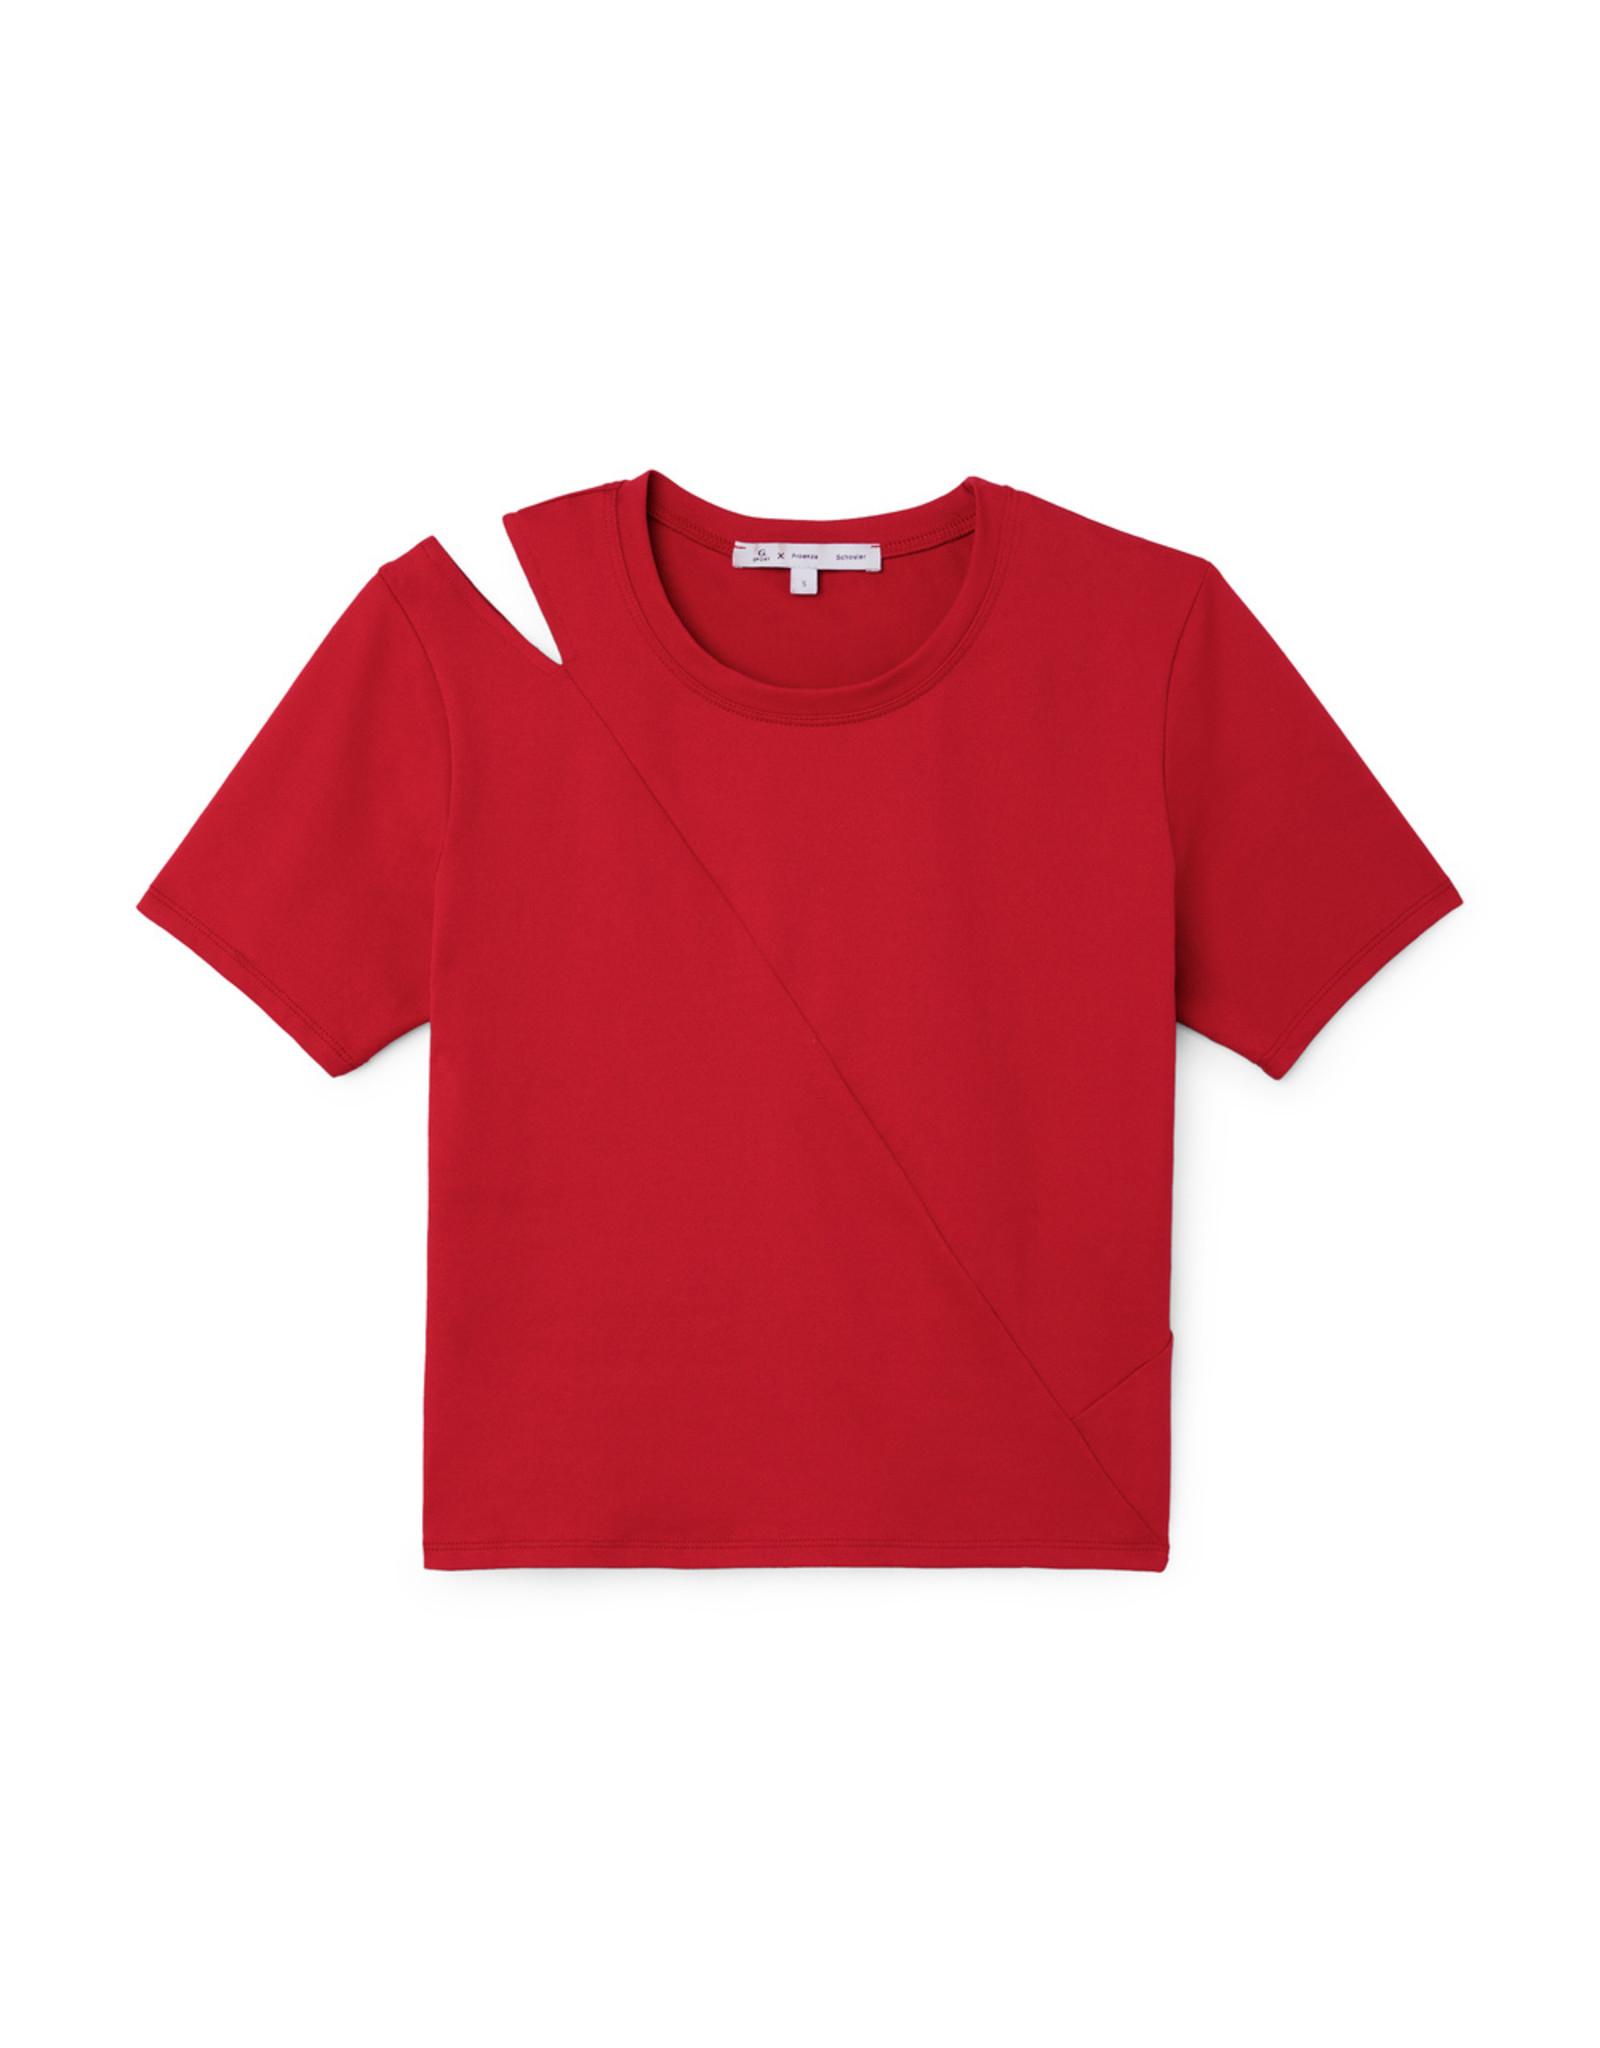 G. Sport x Proenza Schouler G. Sport x Proenza Schouler Short-Sleeve Cutout Top (Color: Red, Size: S)